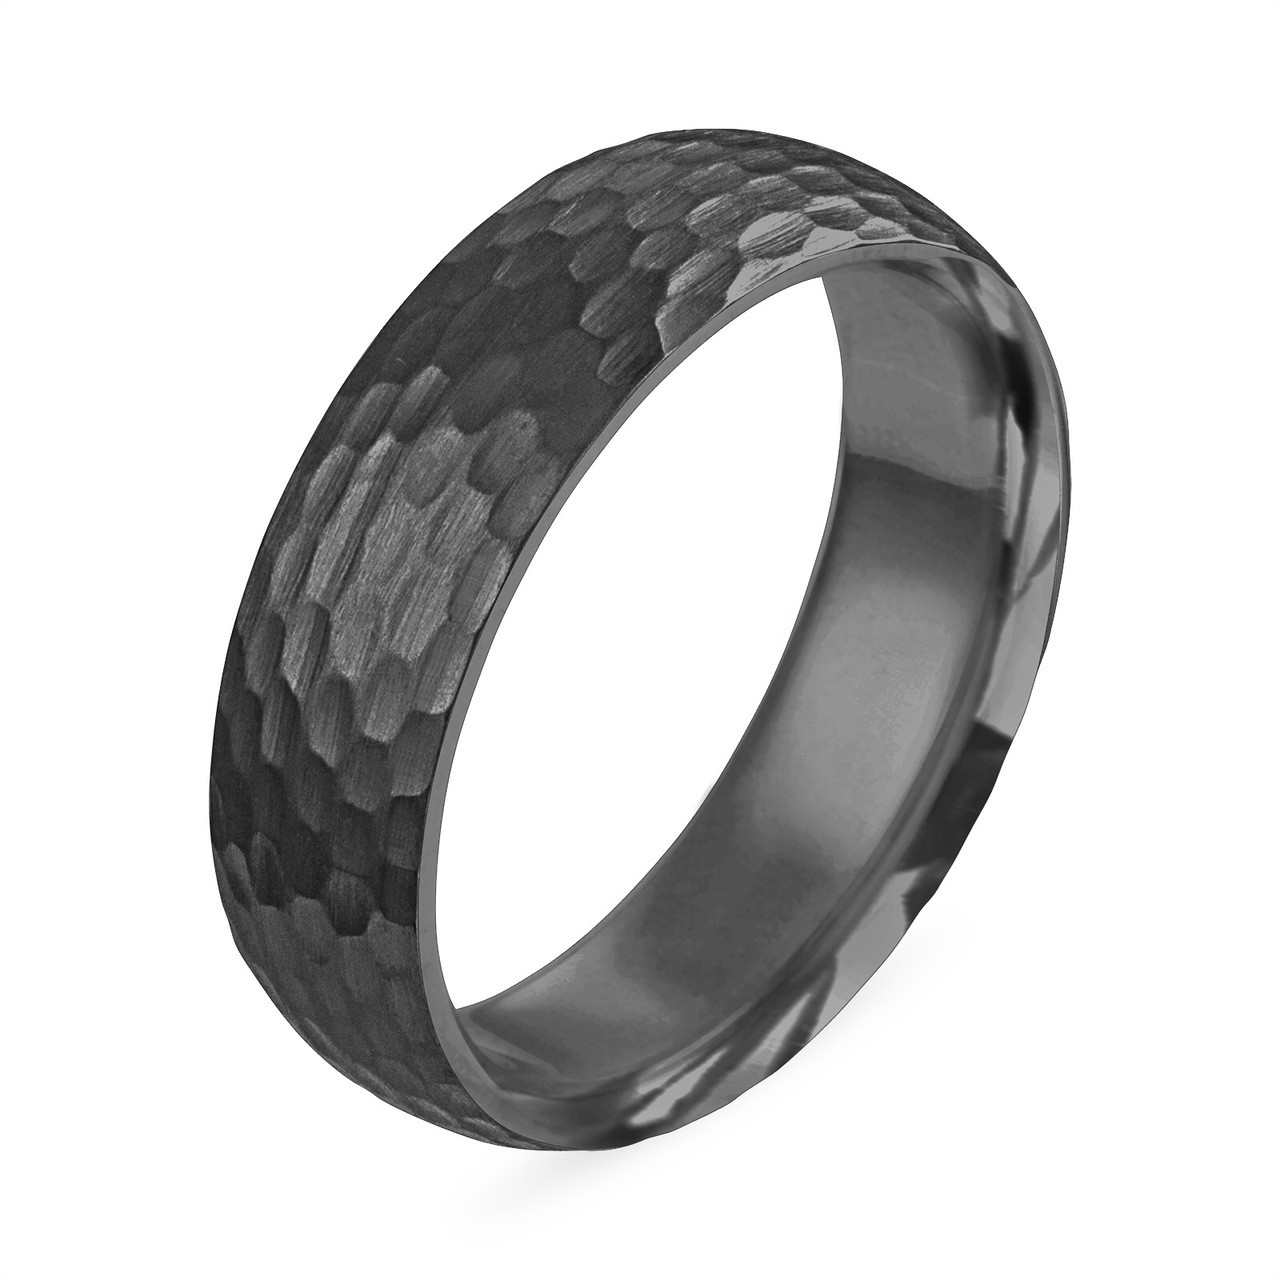 Hammered Finish Wedding Band Black Gold Mens Wedding Ring